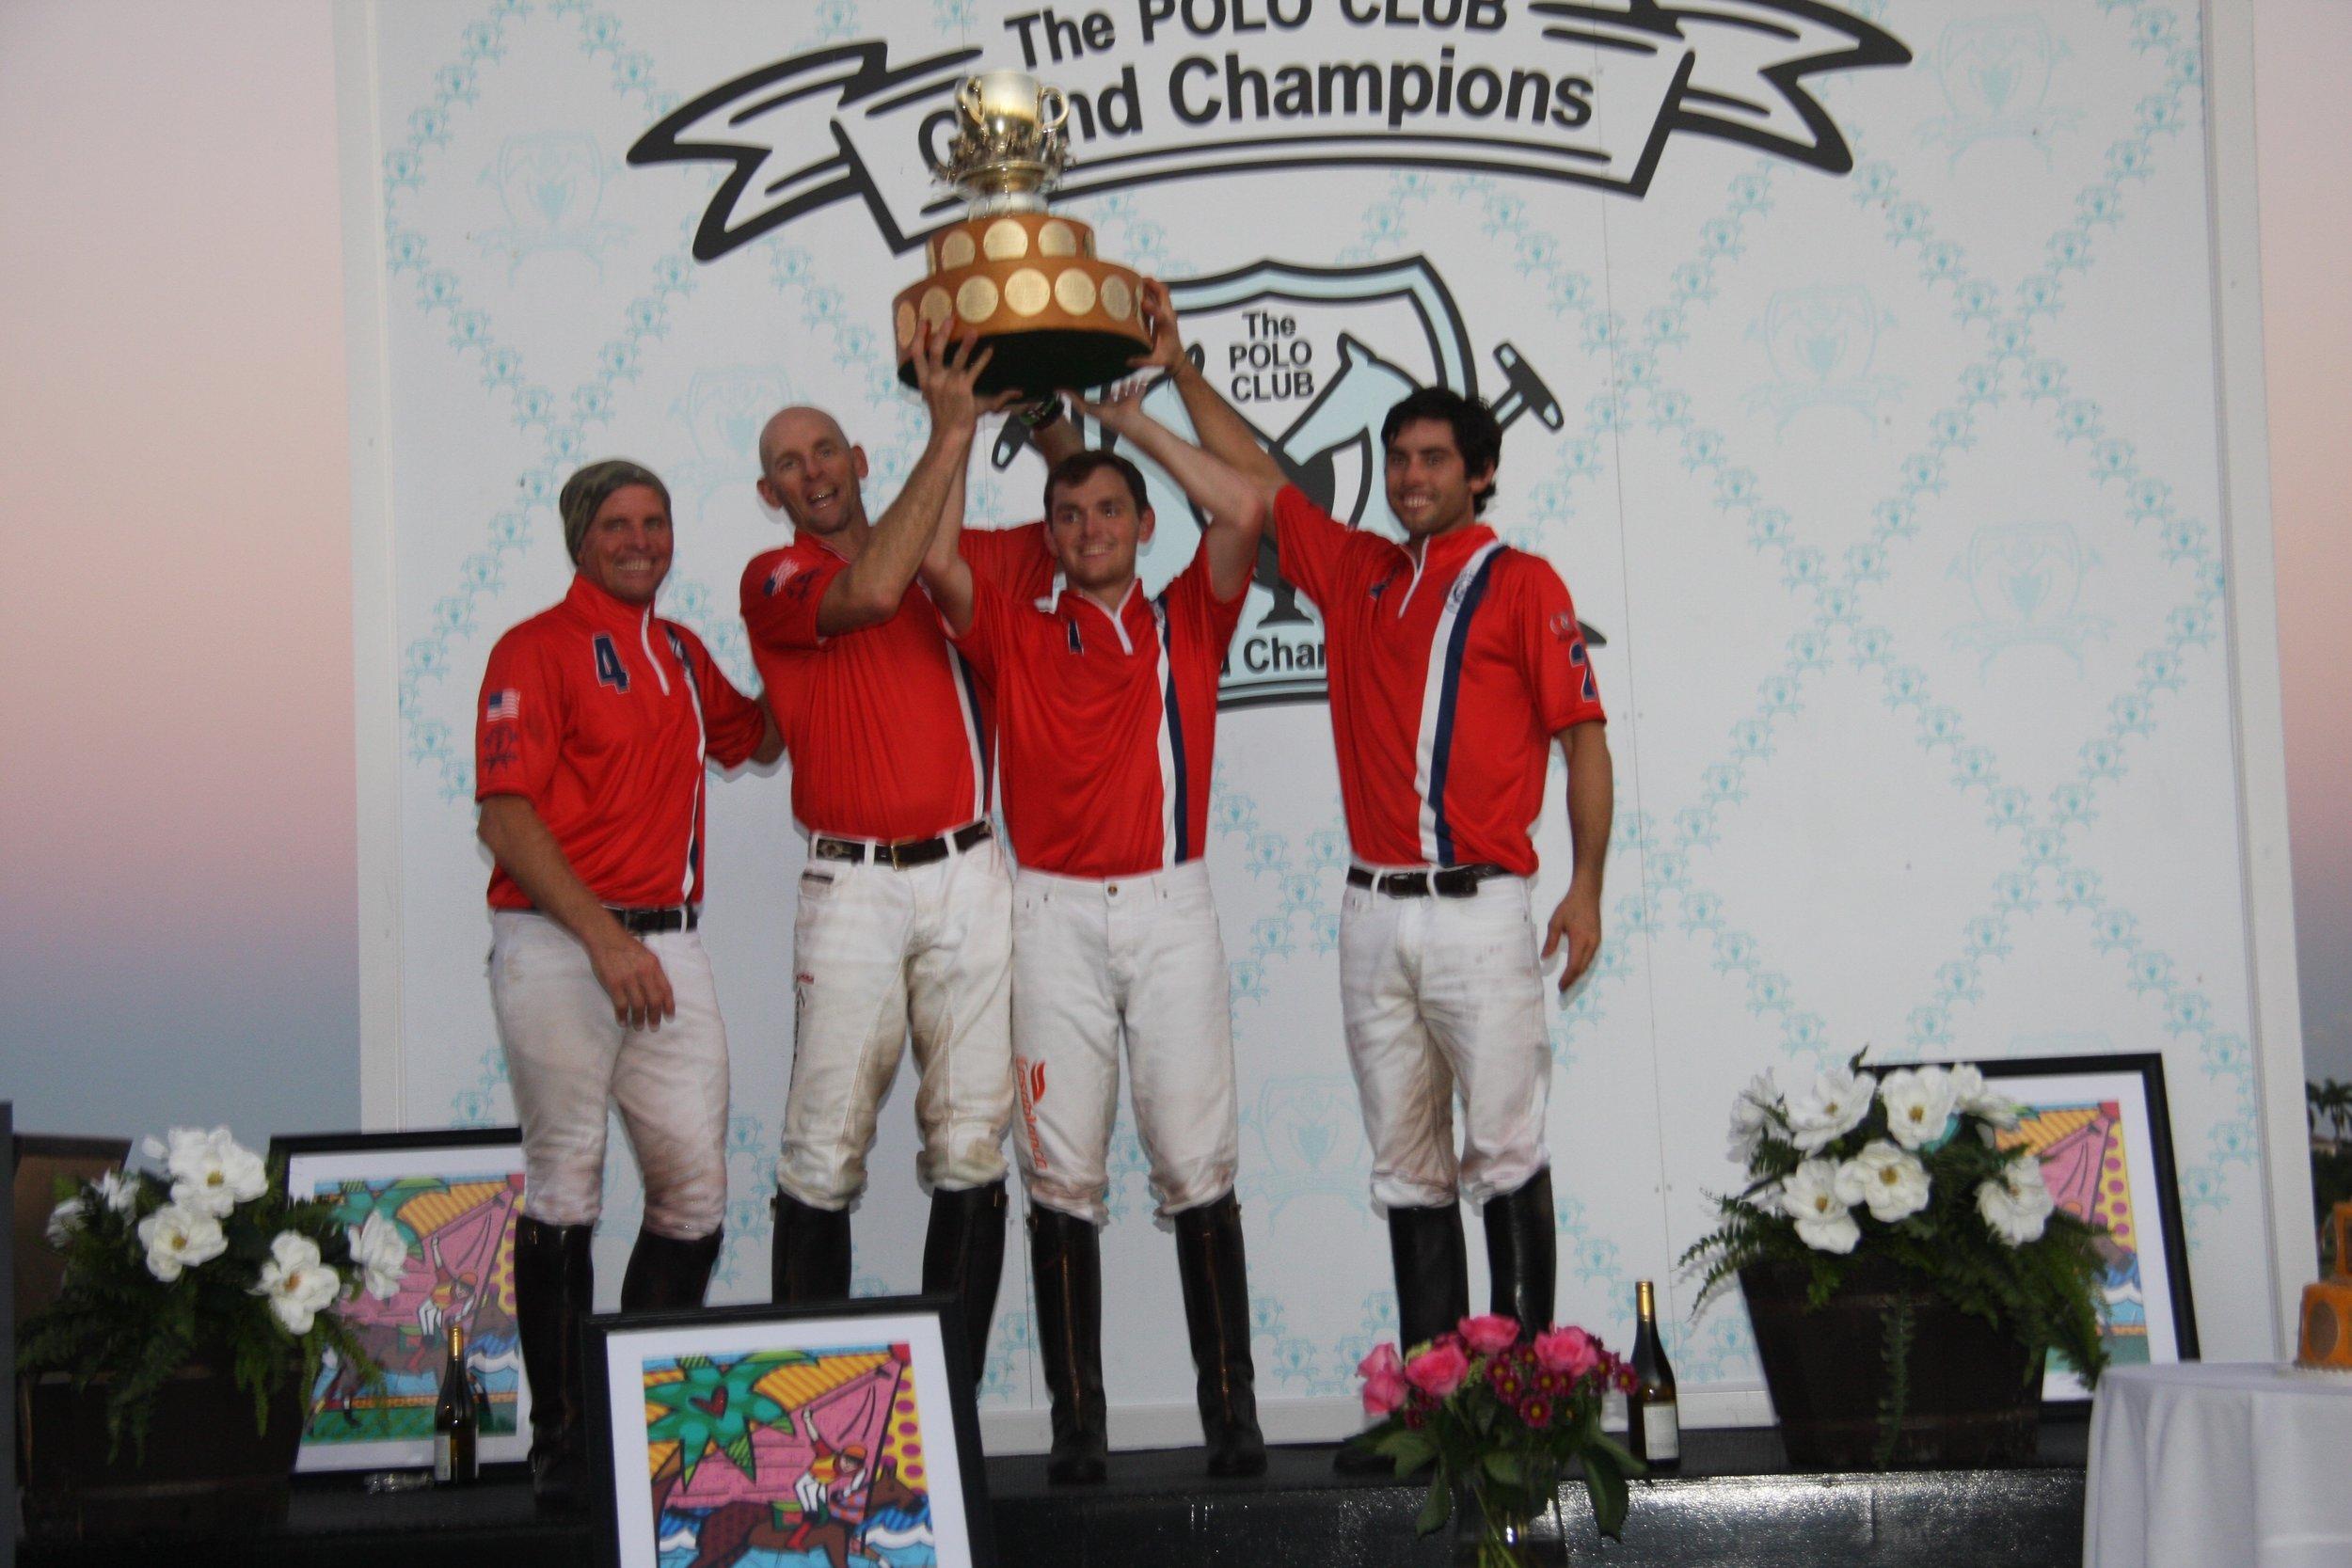 Team USA players Mike Azzaro, MVP Julio Arellano, Carlitos Gracida and Grant Ganzi with International Cup. Photo by Sheryel Aschfort